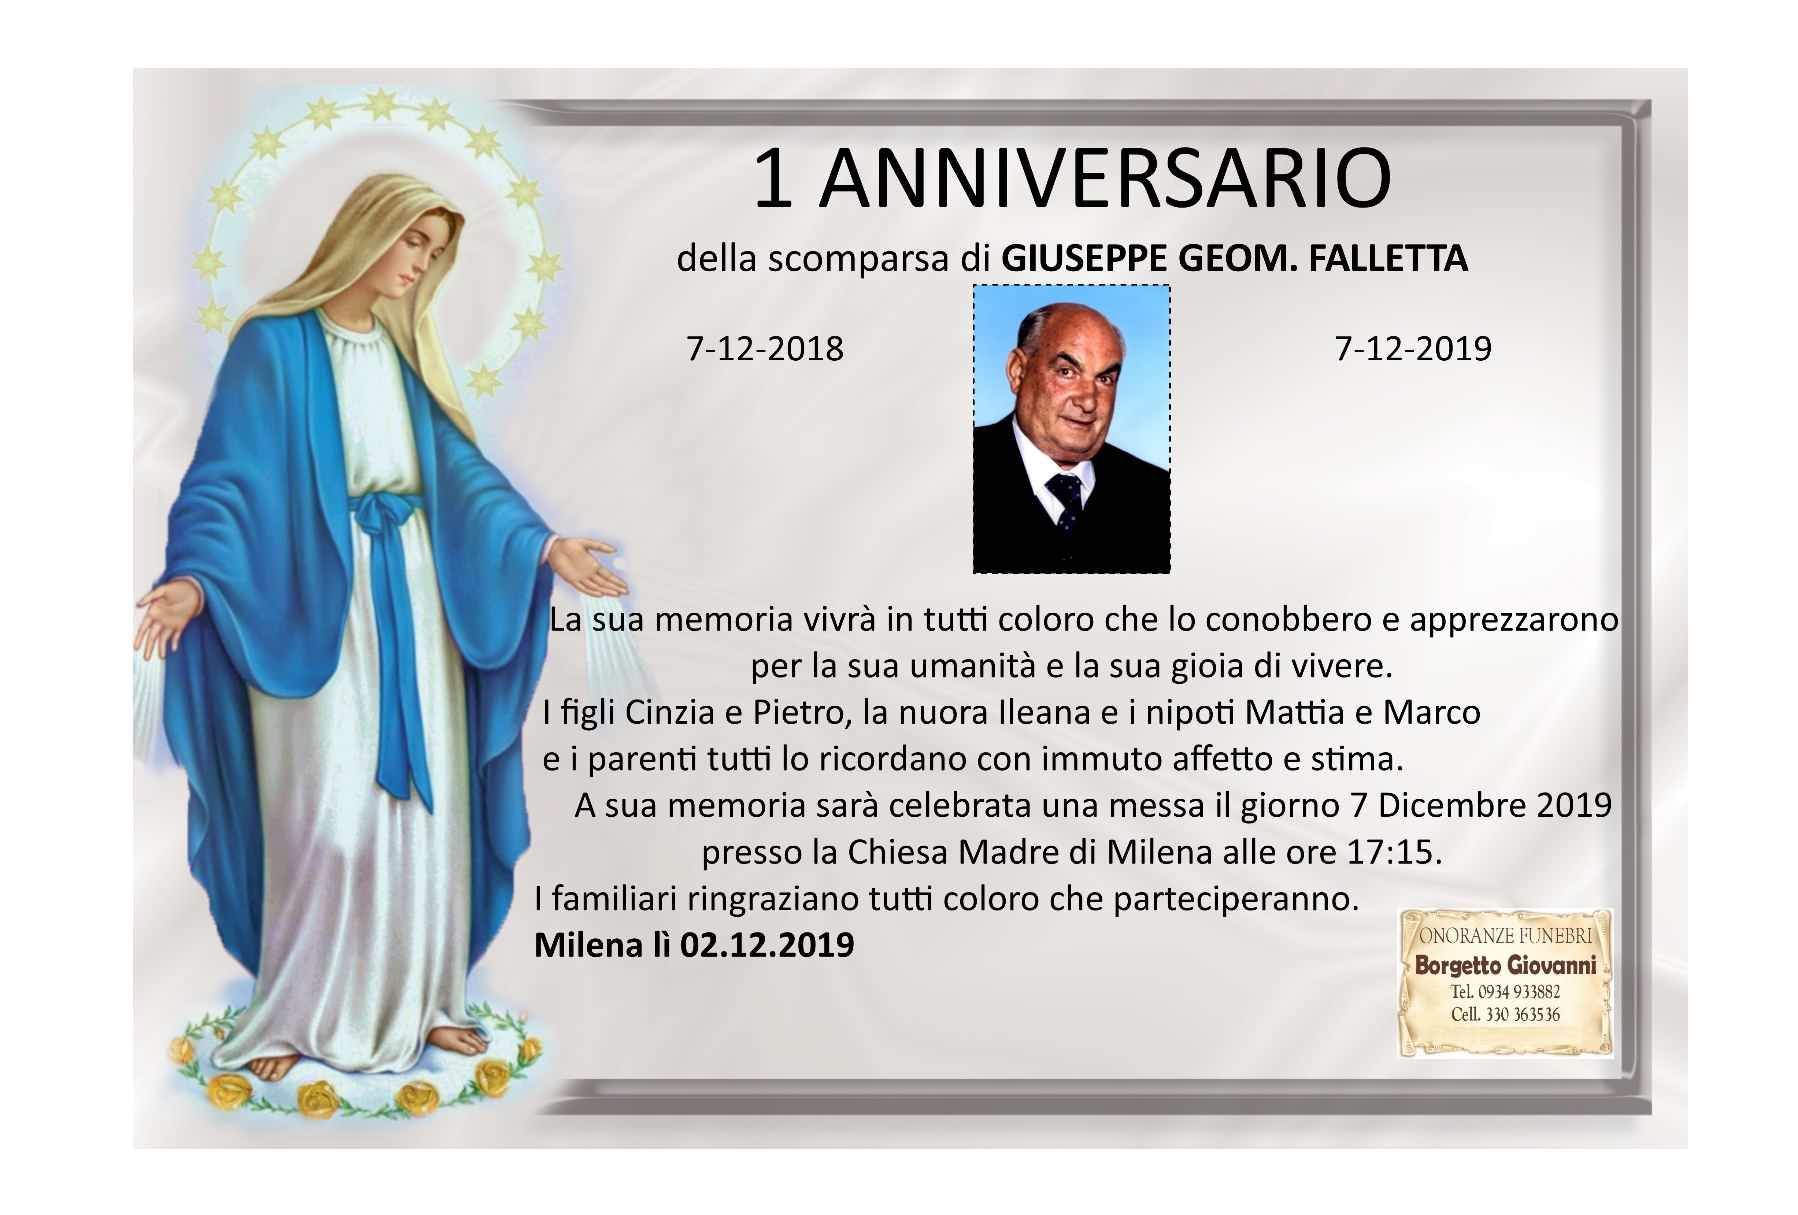 Giuseppe Falletta